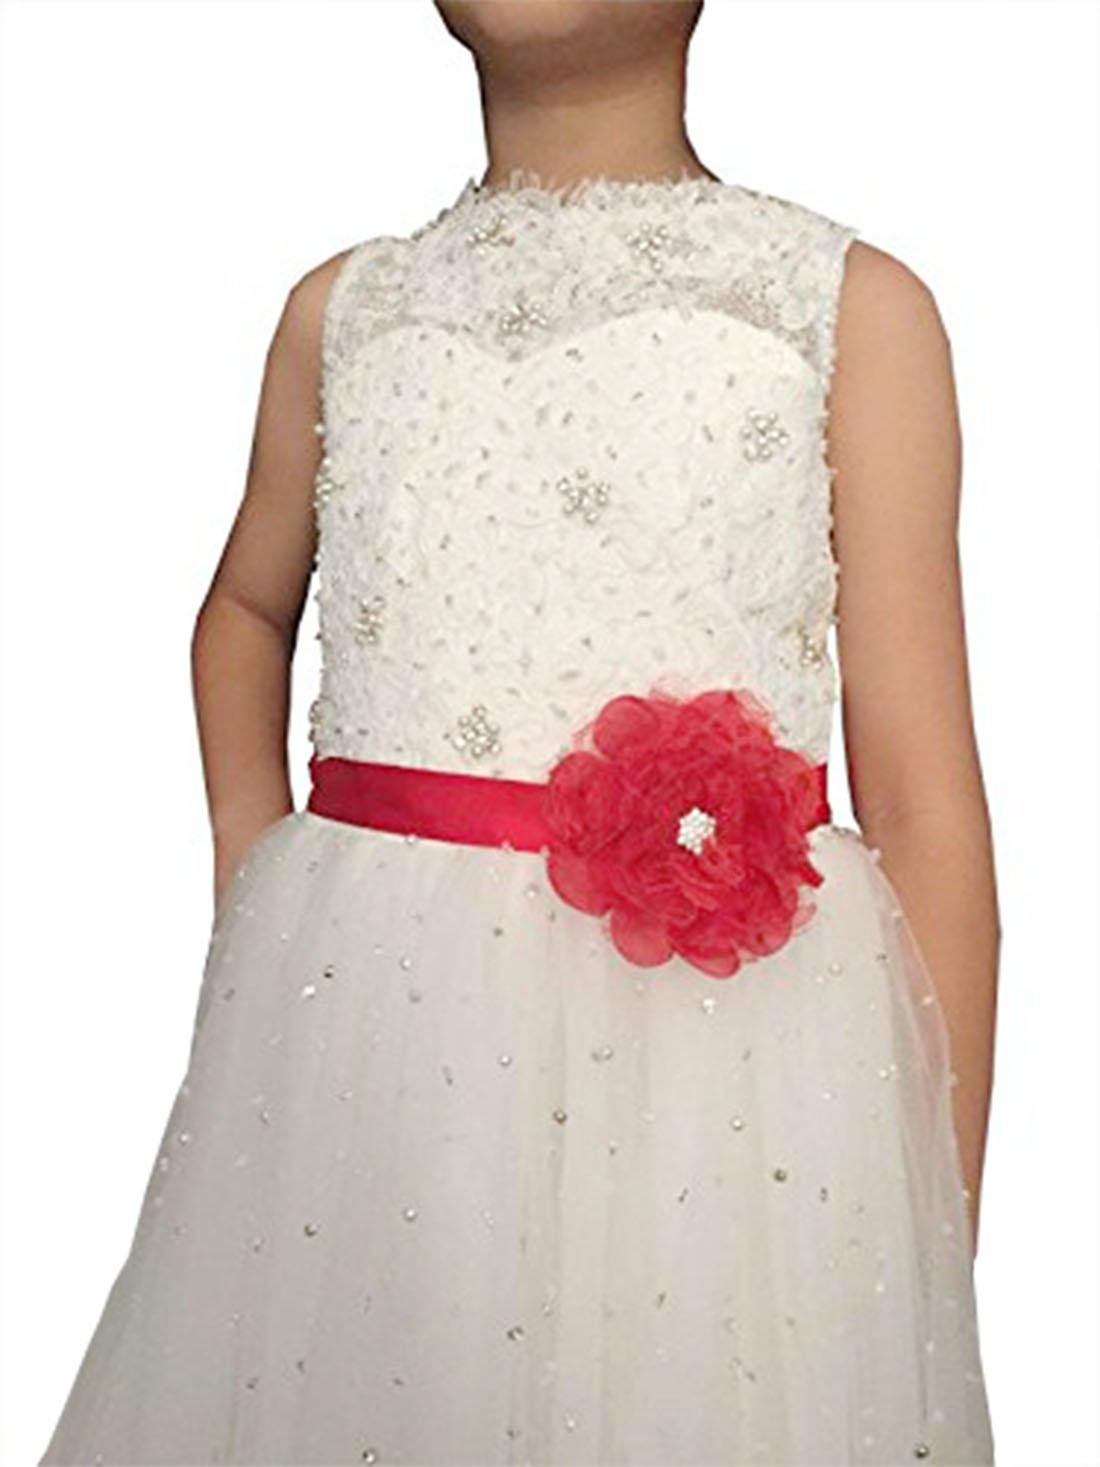 Lemandy Handmade Flowergirl Sash Children Belt For Wedding/Prom/Evening D2